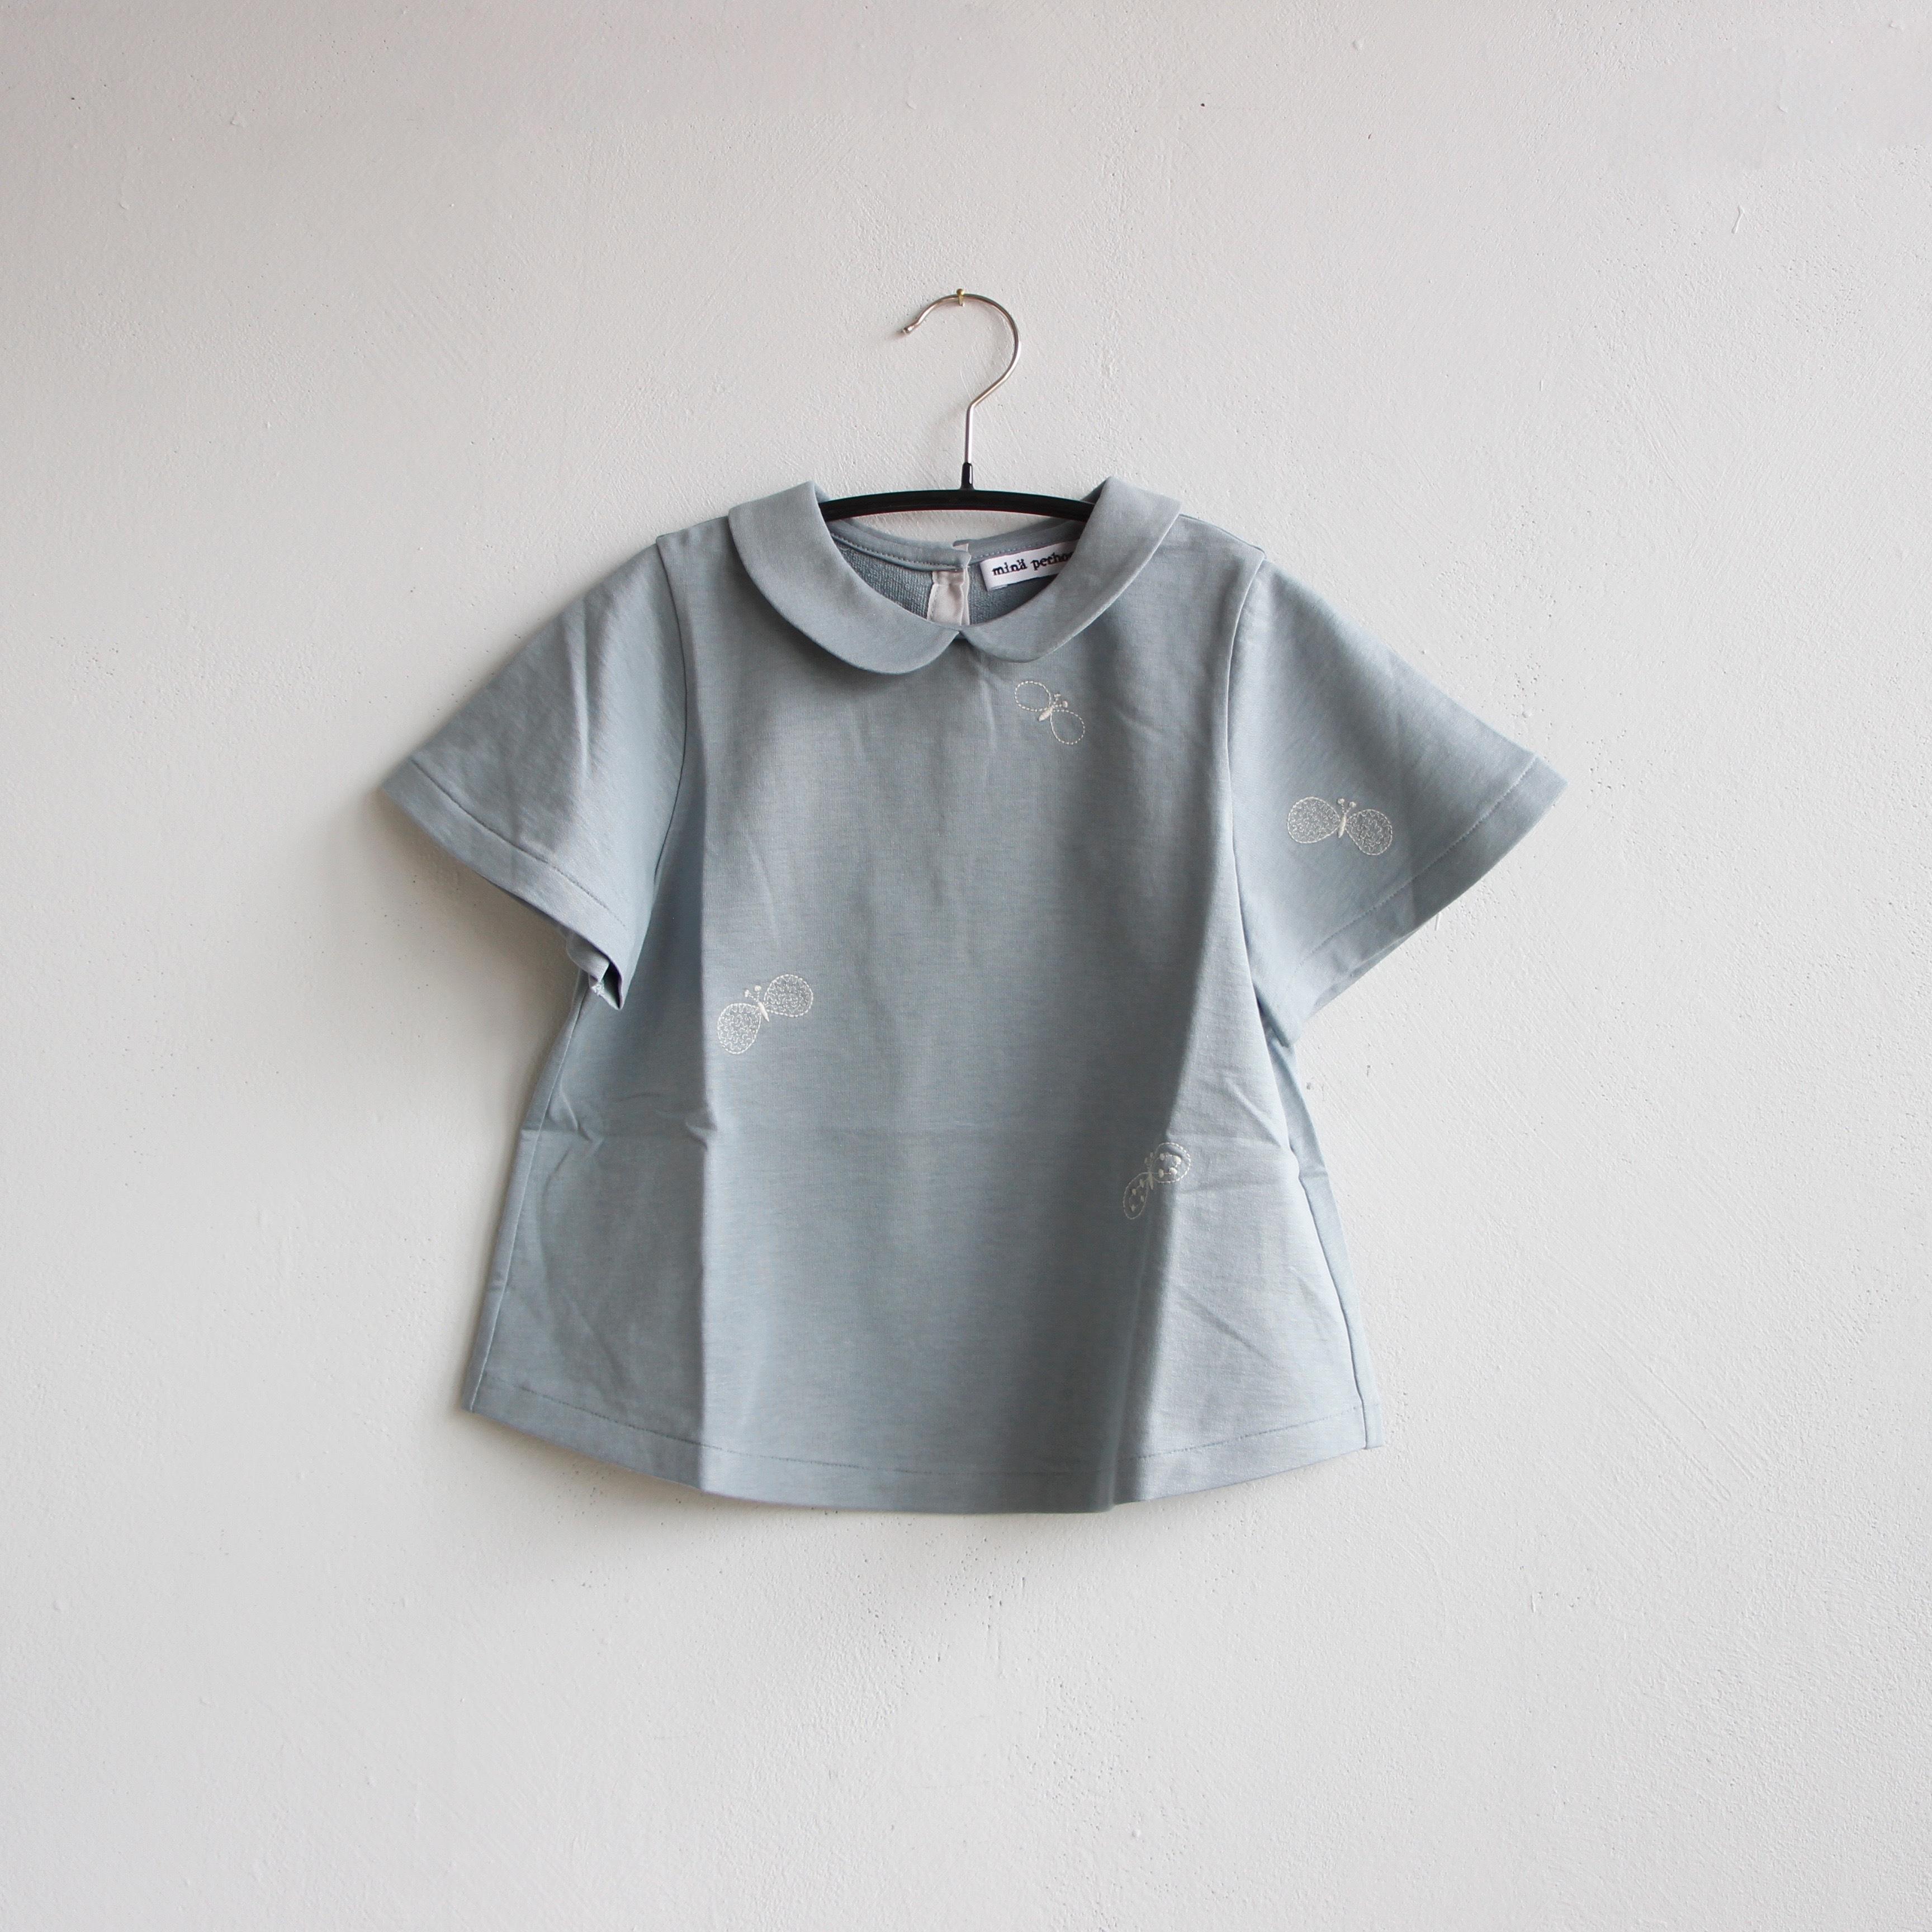 《mina perhonen 2020SS》choucho 半袖カットソー / blue gray / 80-100cm